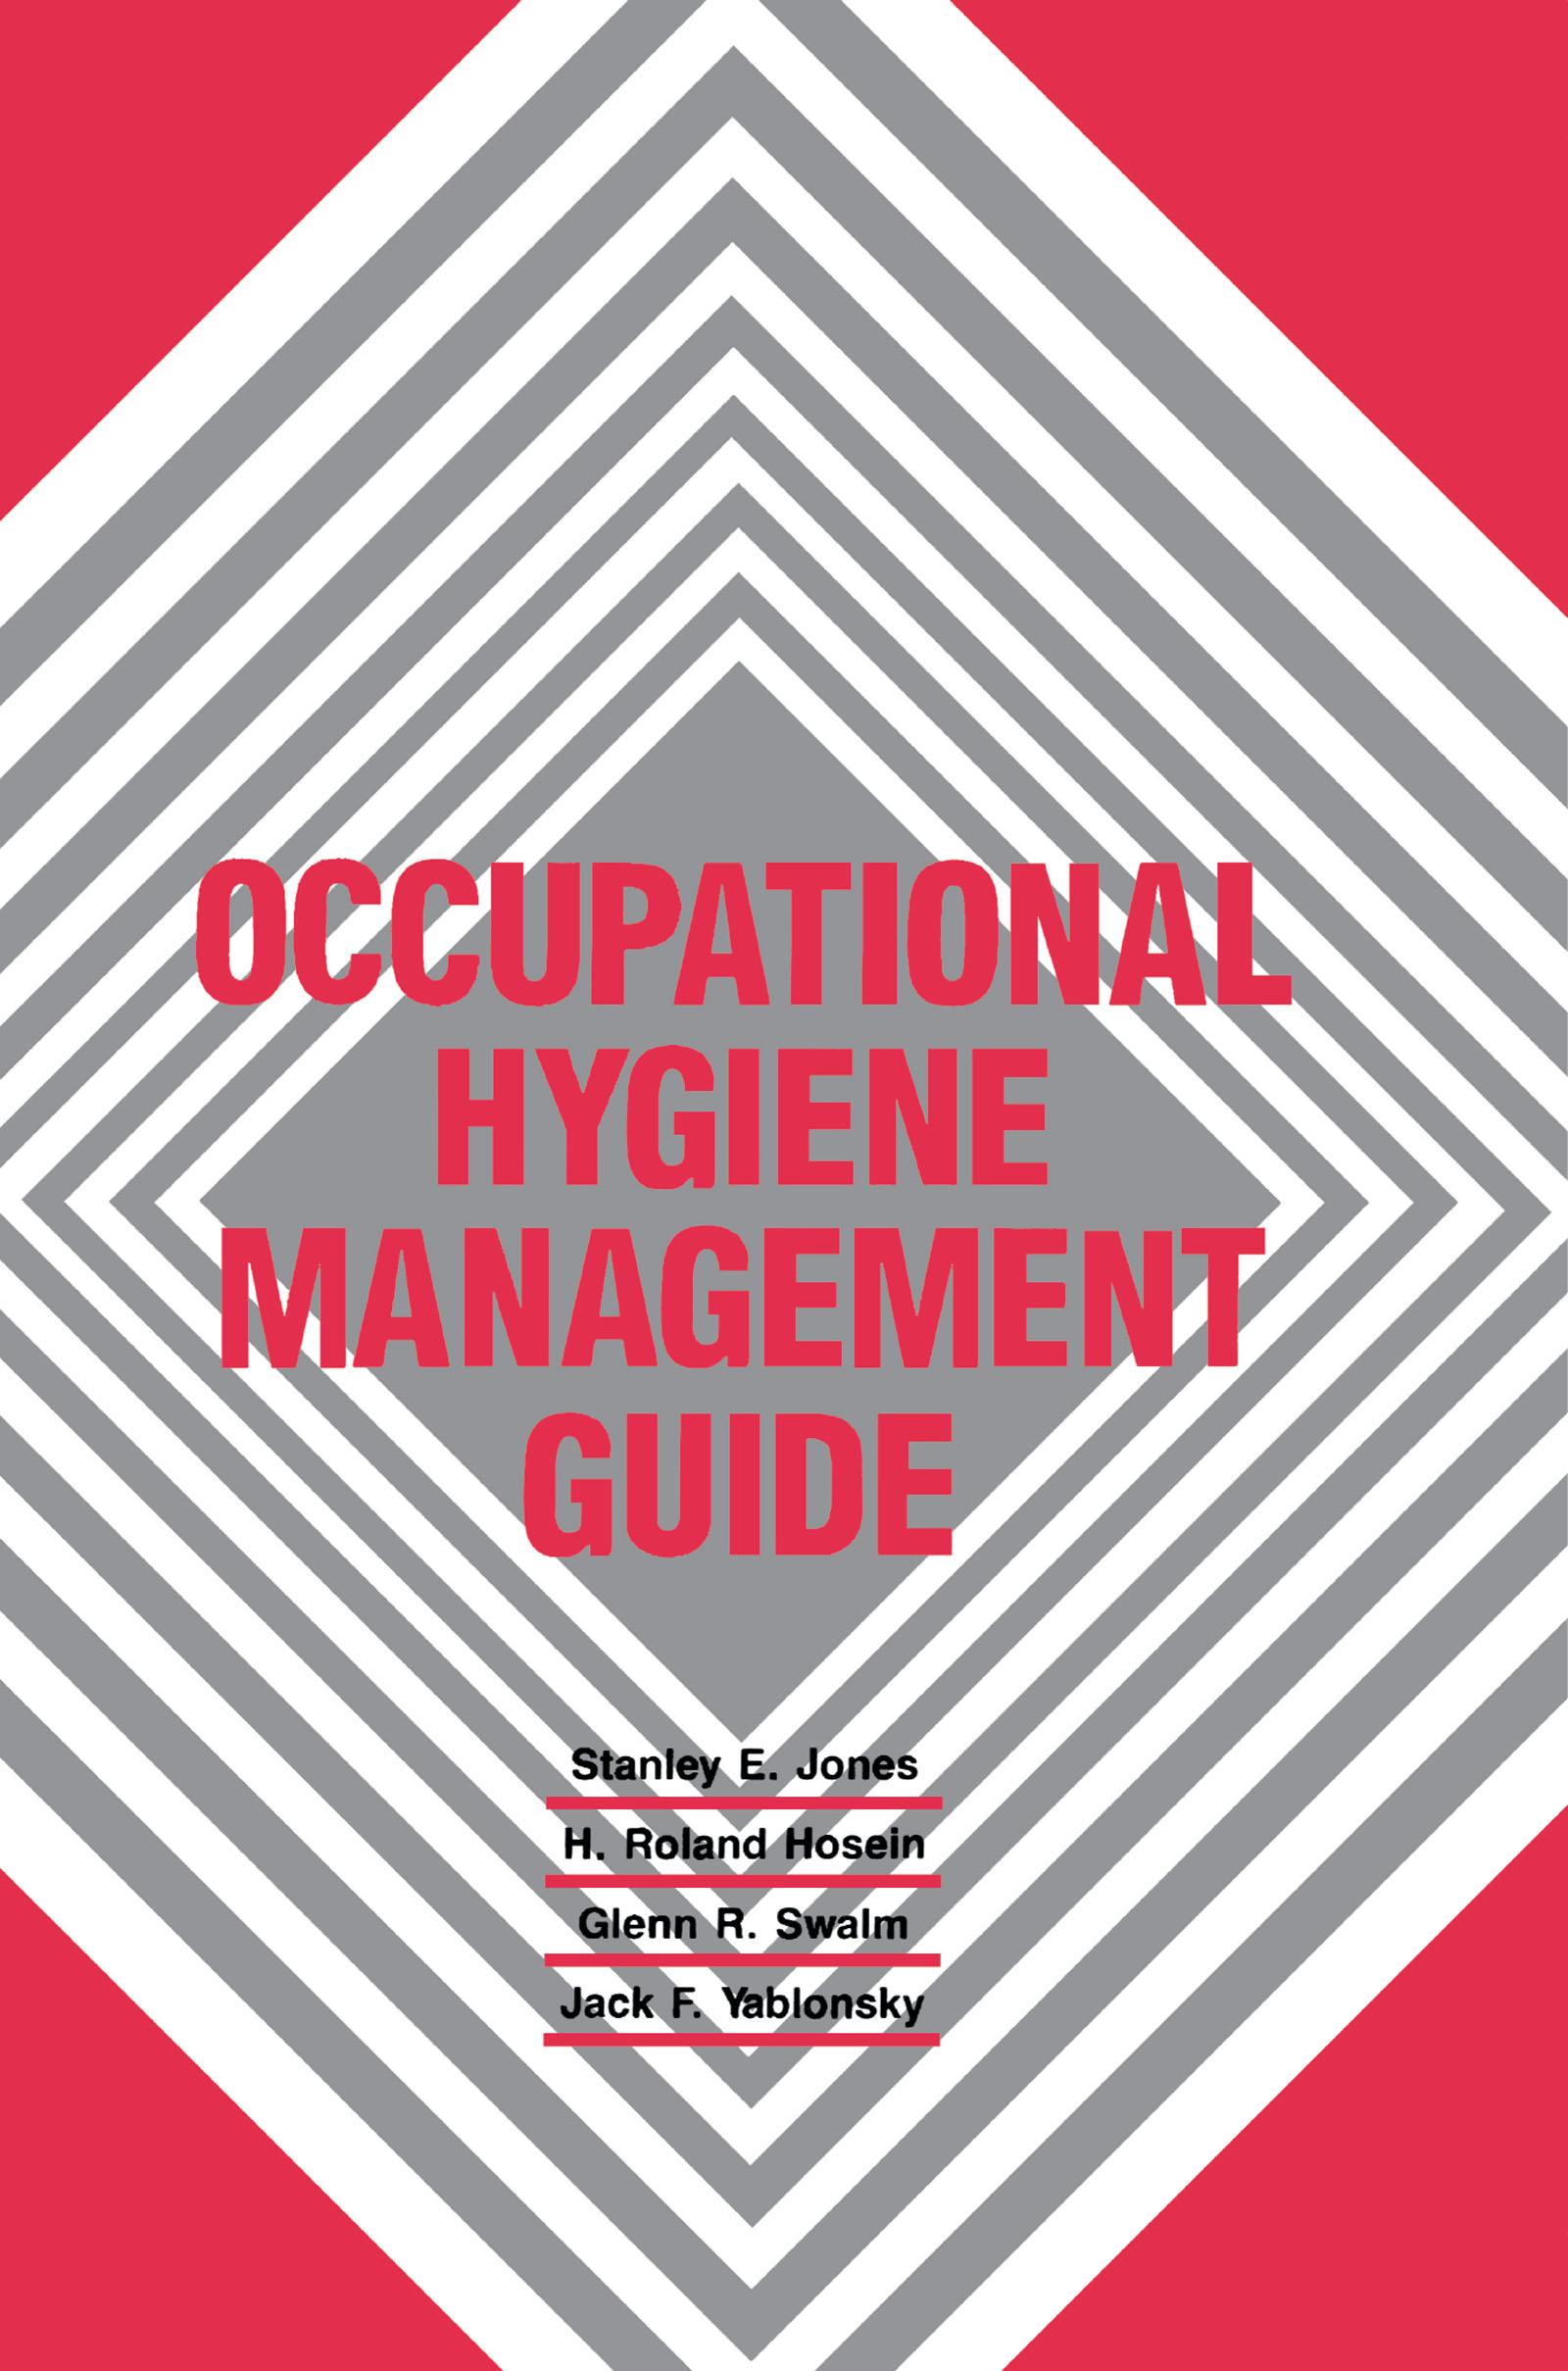 Occupational Hygiene Management Guide